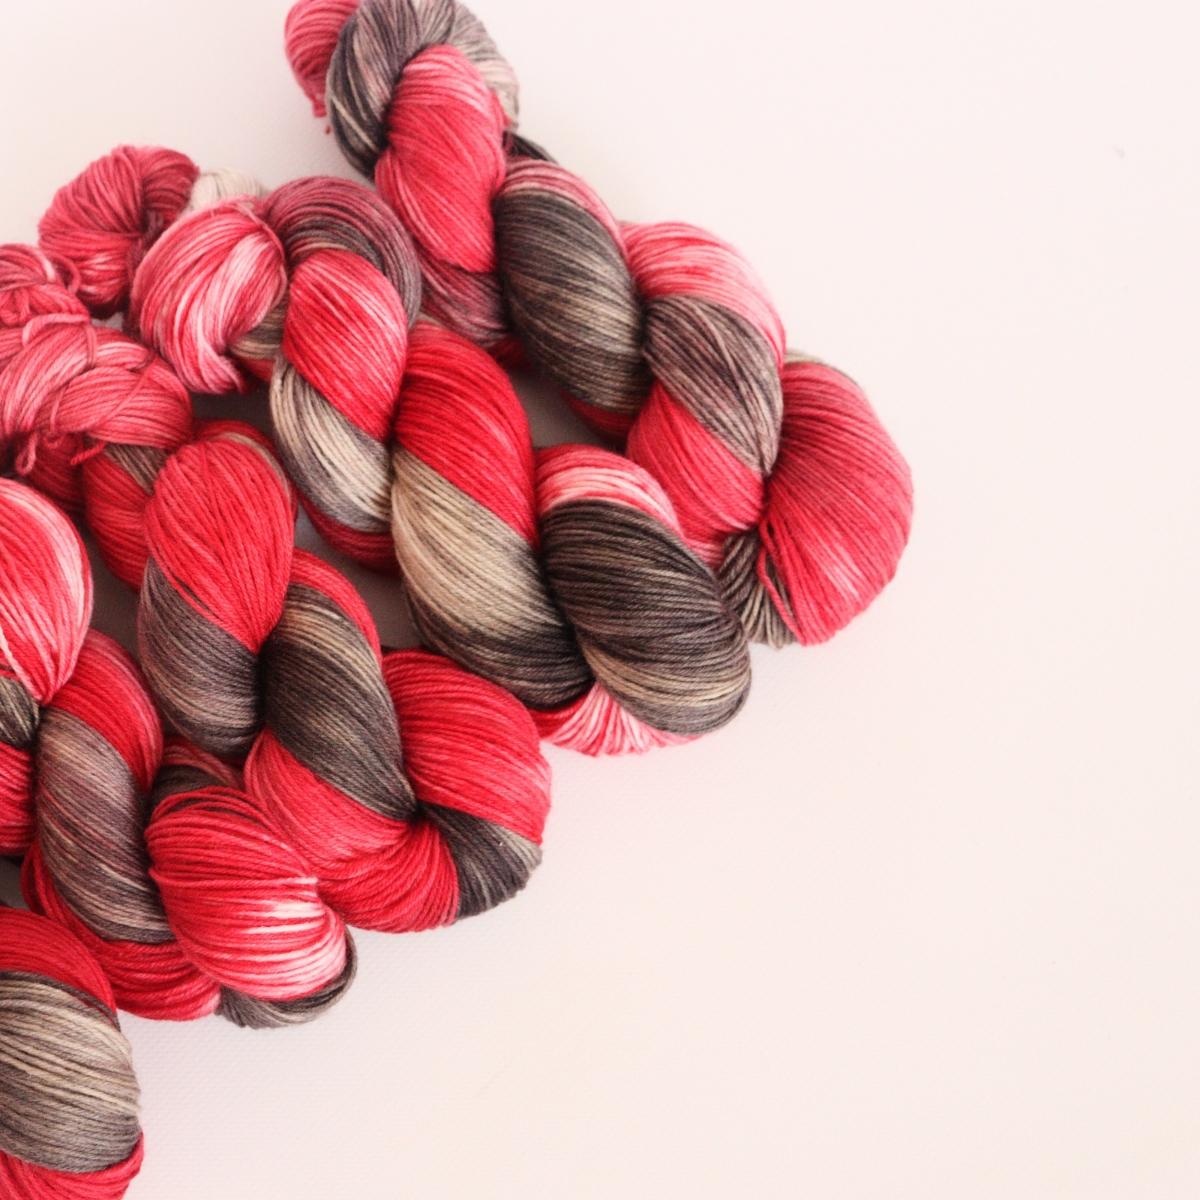 woodico.pro hand dyed yarn 056 4 1200x1200 - Hand dyed yarn / 056